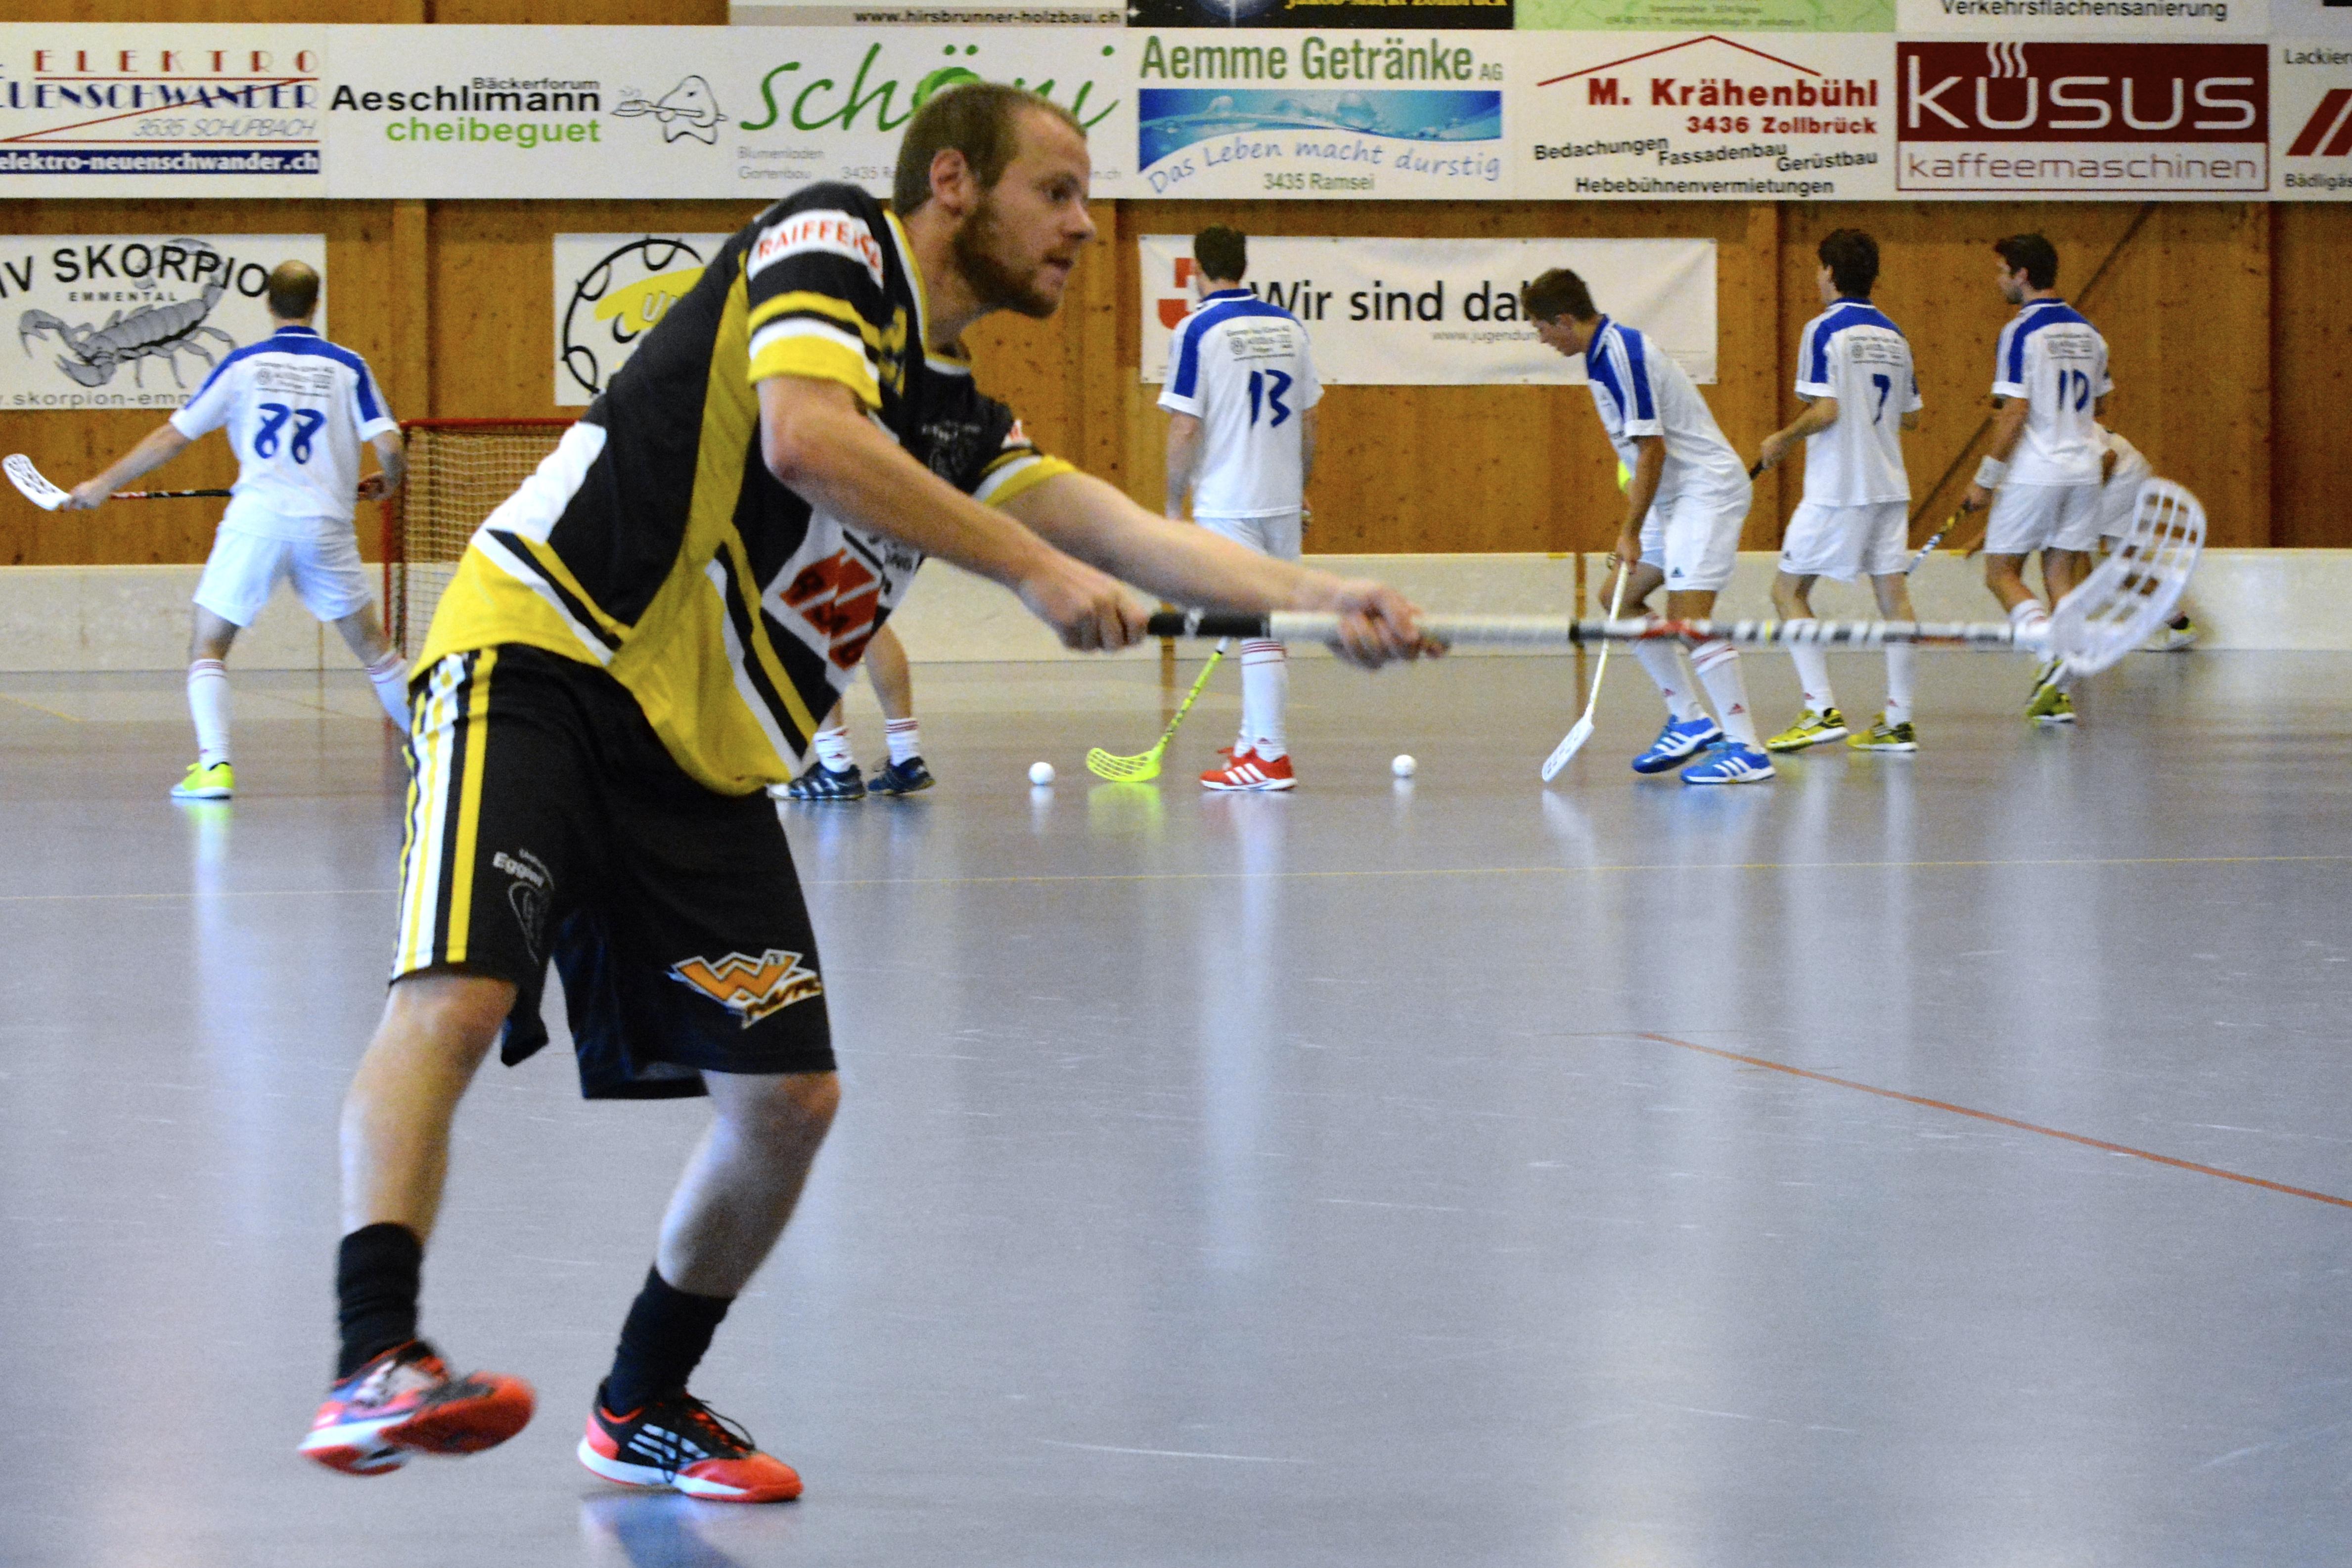 Herren Aktive GF 3.Liga - UHT Tornados Frutigen Saison 2014/15